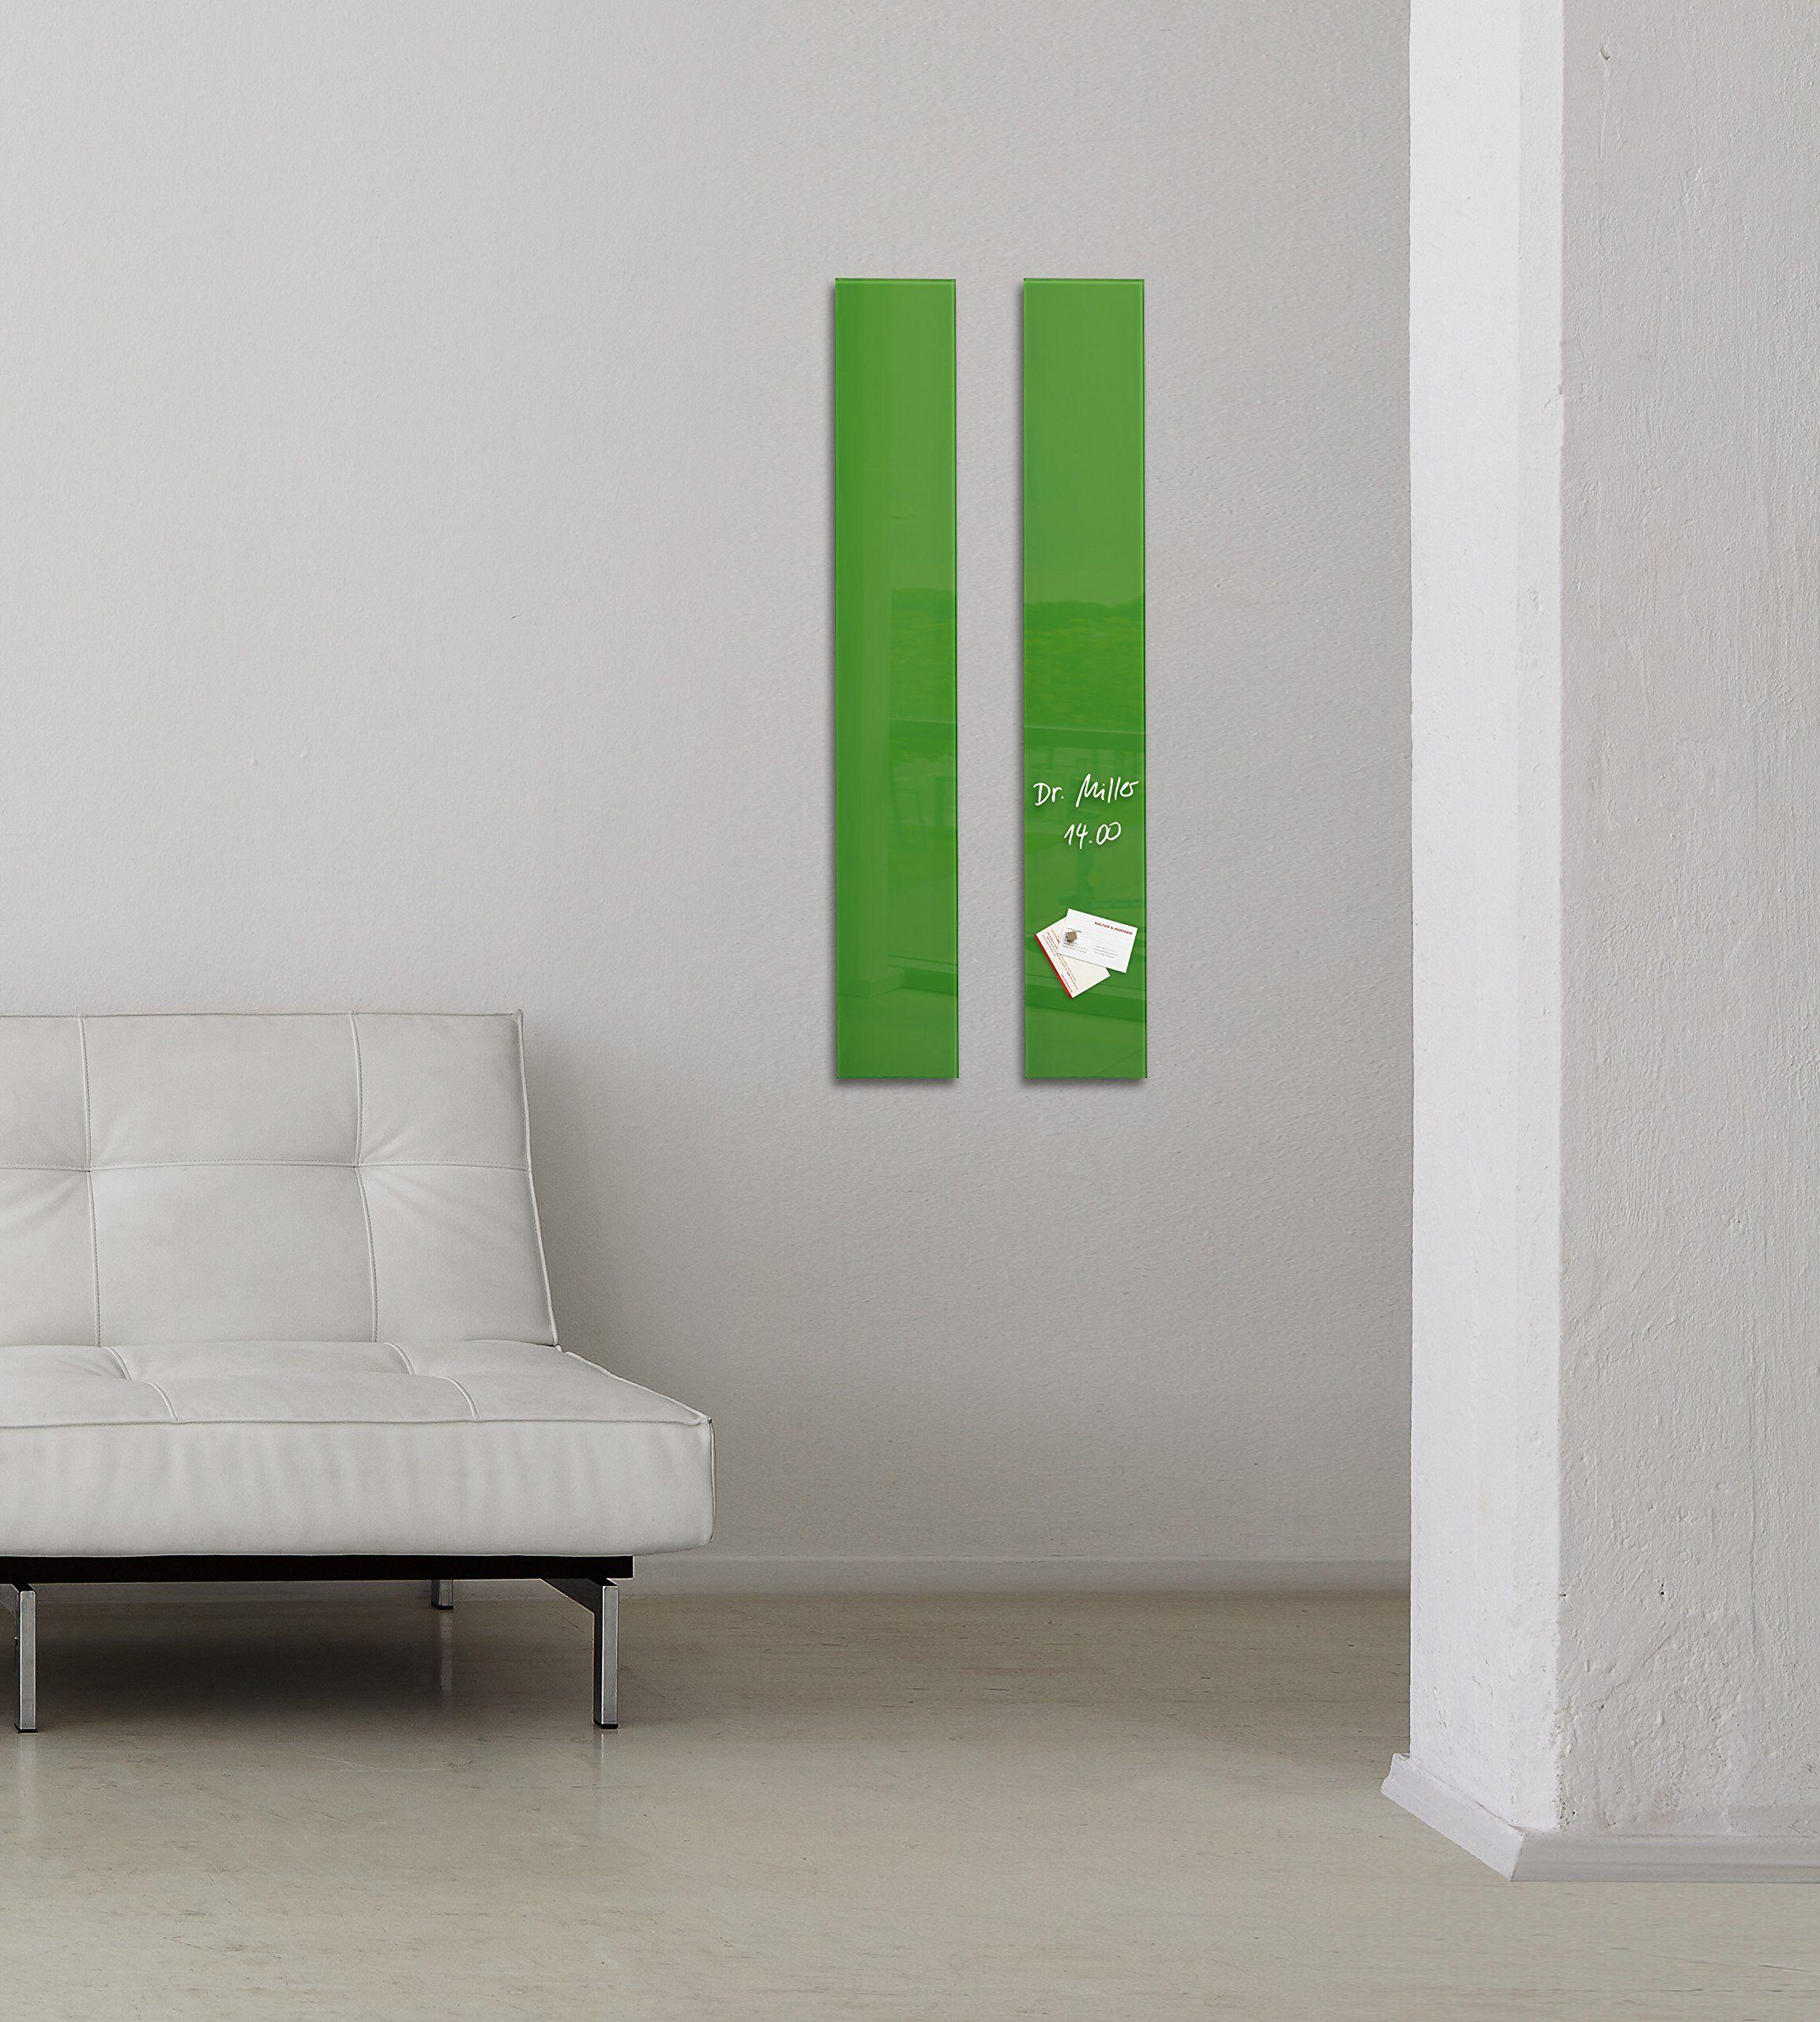 Sigel gl251 glas magnetboard magnettafel artverum 12 x 78 cm grün